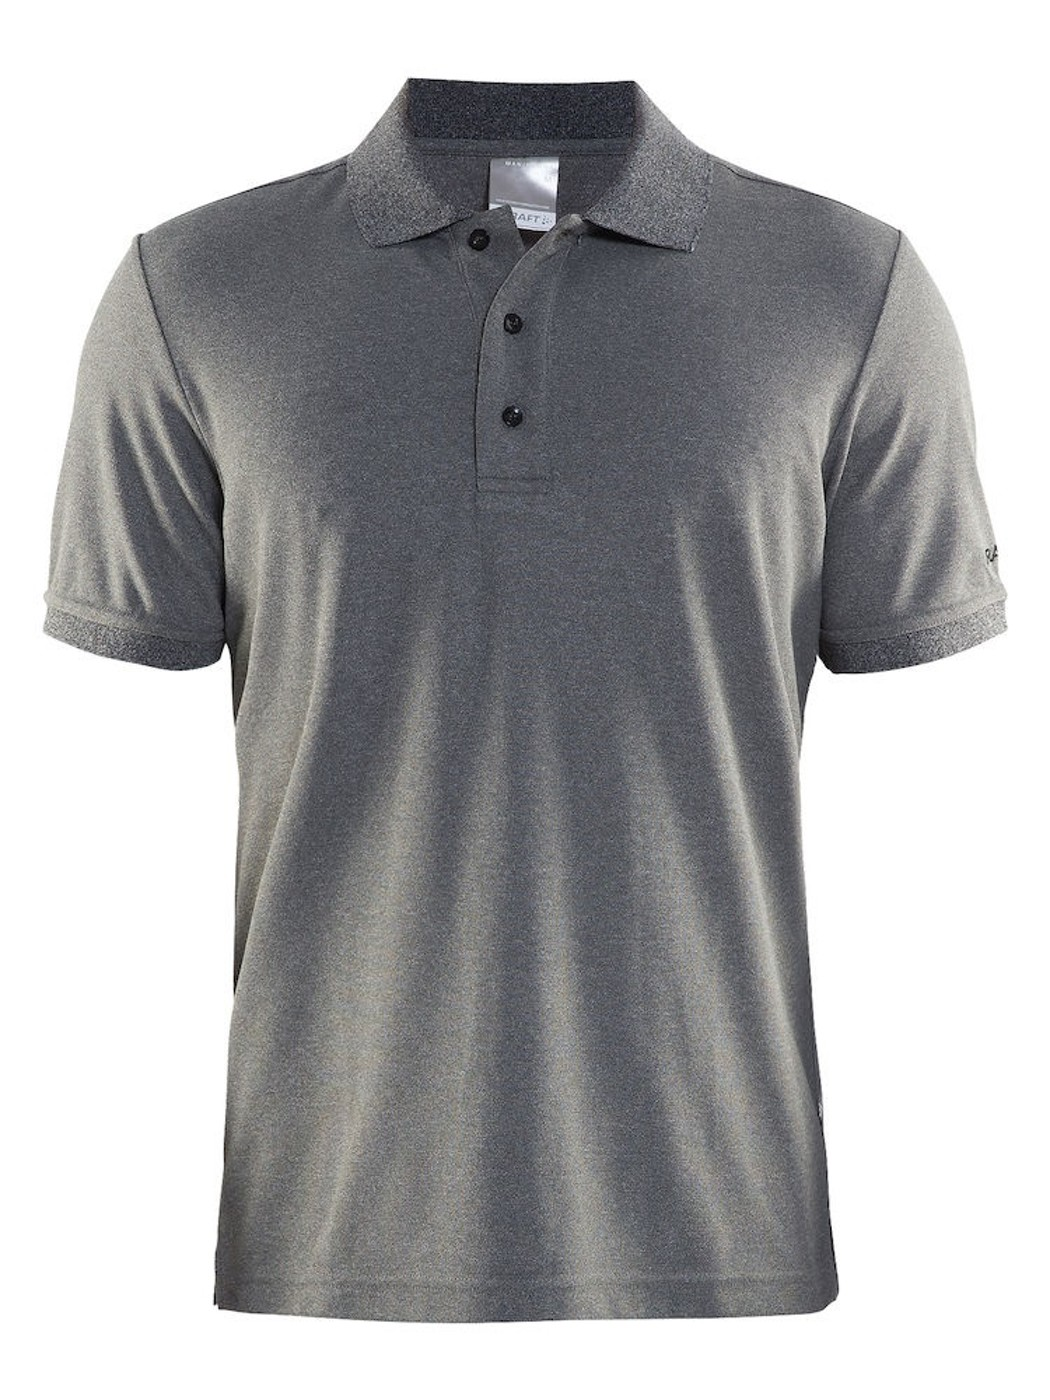 CRAFT Polo Shirt PIQUE CLASSIC - Herren